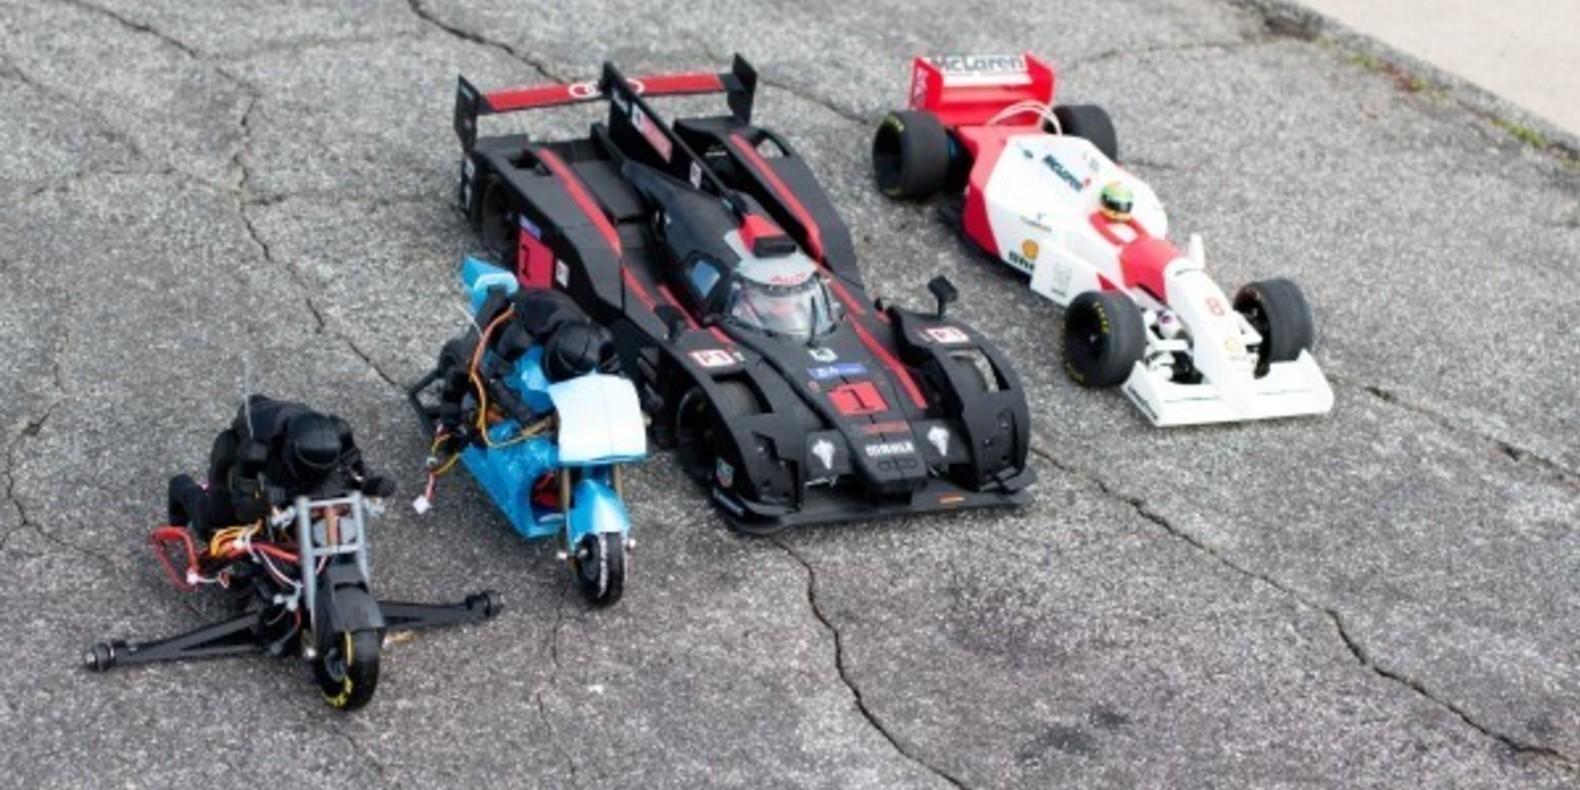 brett-3D-model-moto-télécommandée-cults-7.jpg